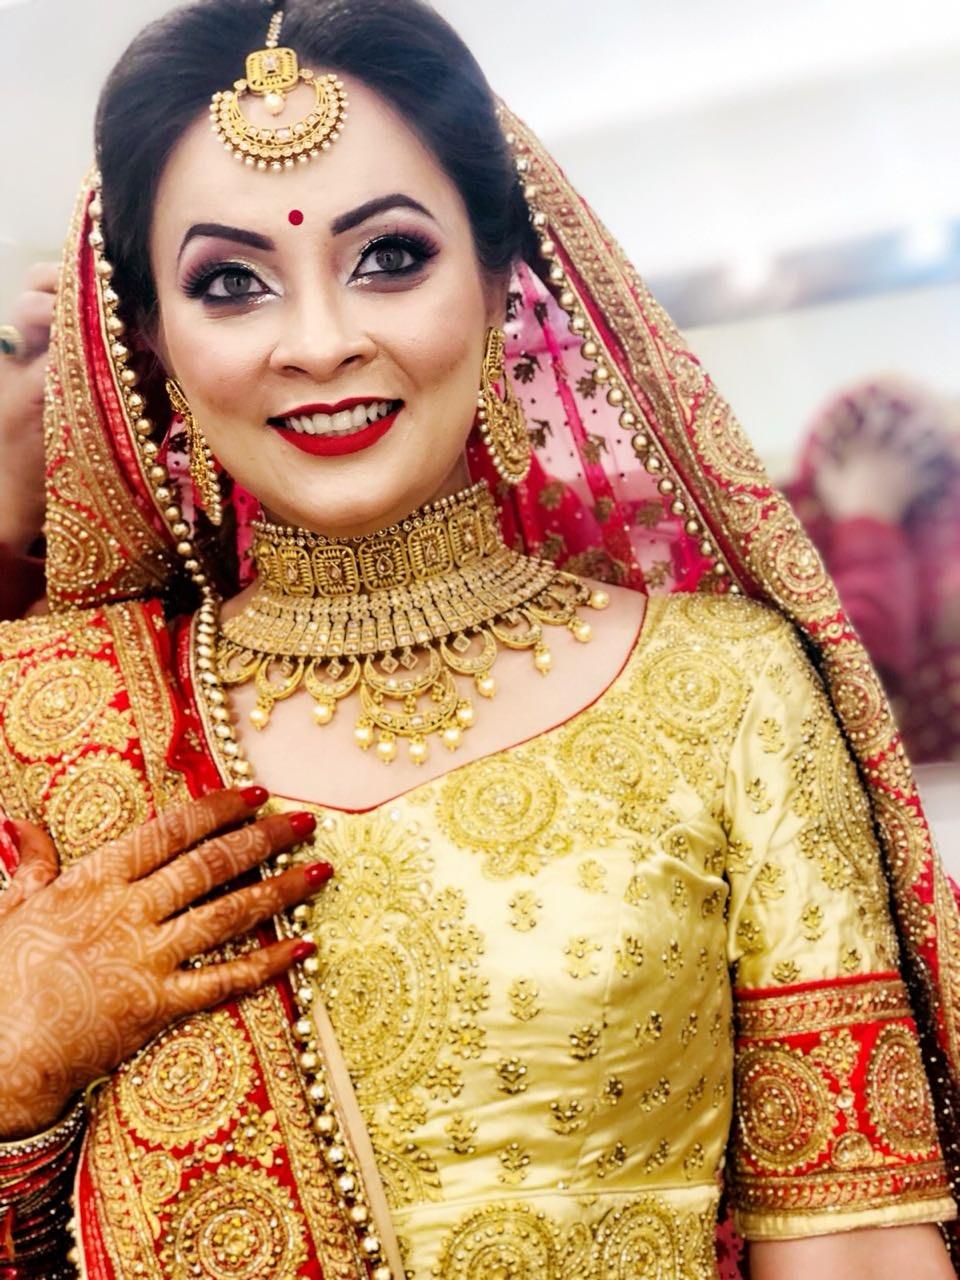 Portfolio - Meera Bhandari Makeovers